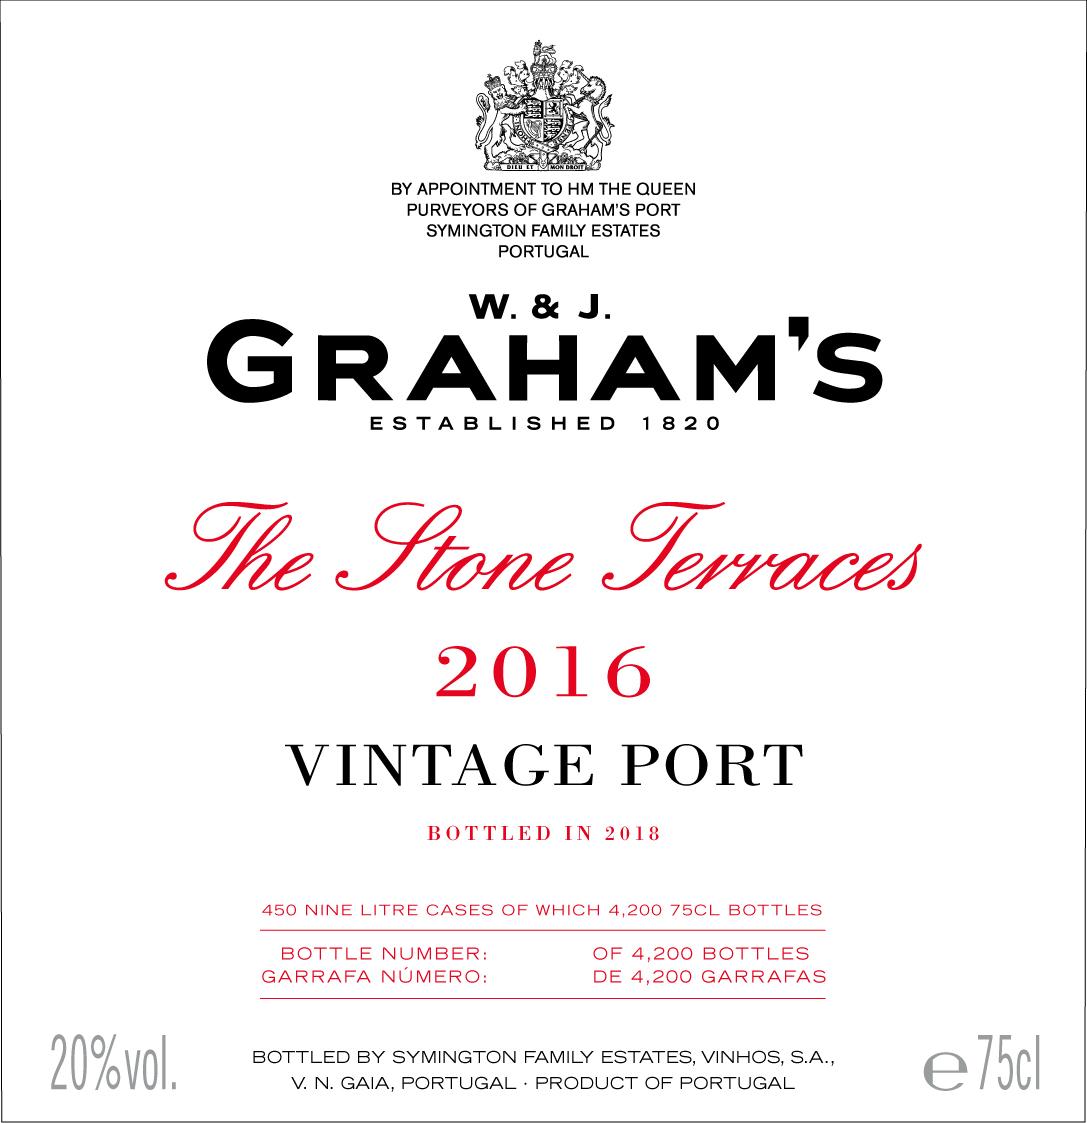 Graham's The Stone Terraces label